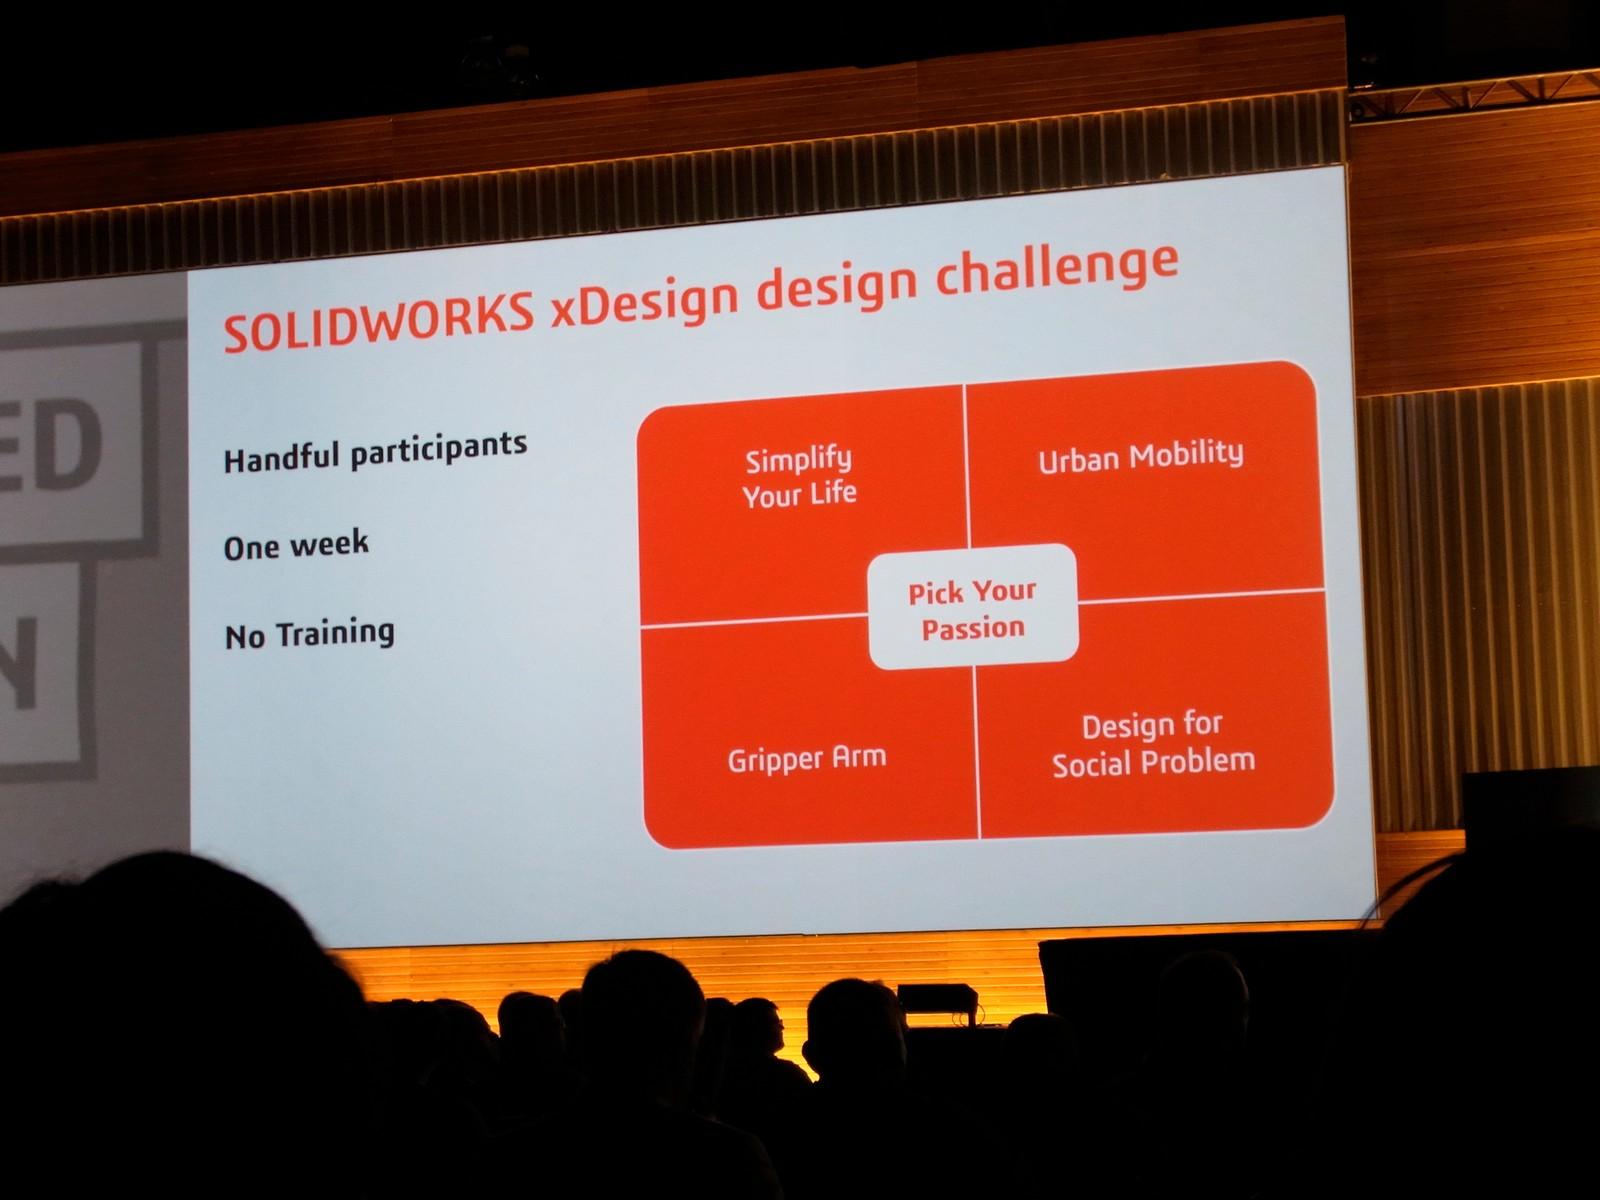 xDesign Design Challenge